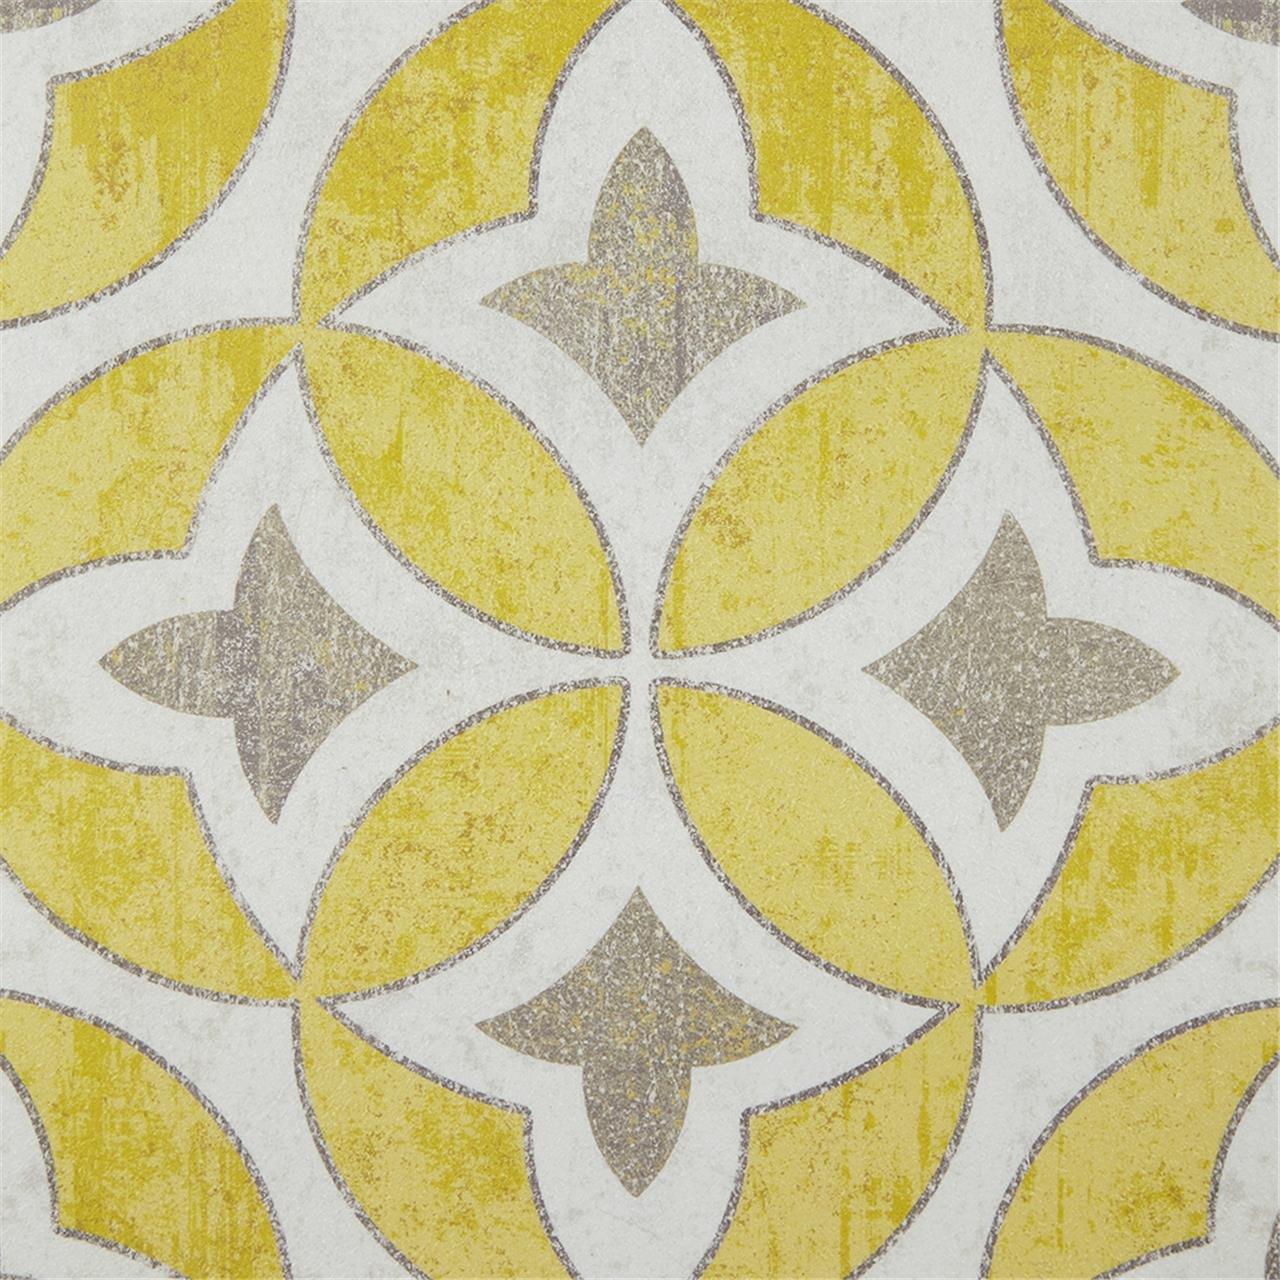 Amazon.com: Madison Park Tuscan Tiles Framed Grey White Canvas Wall ...